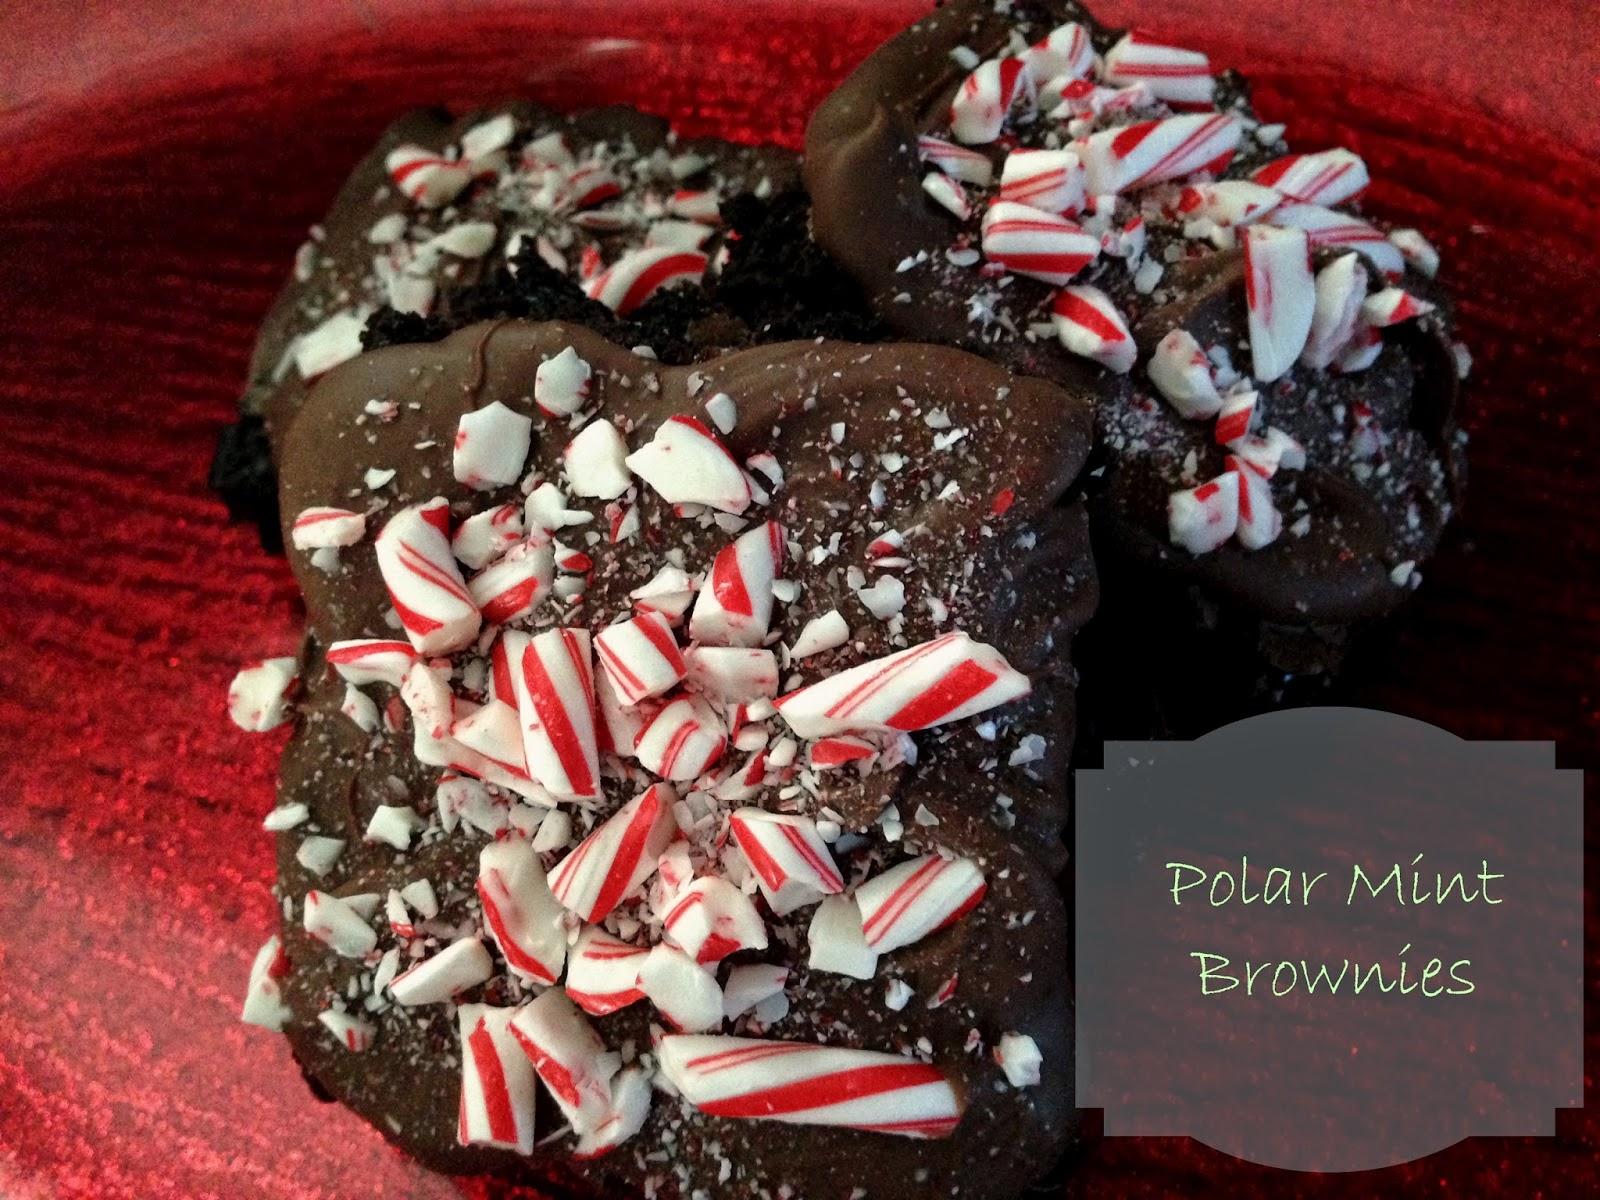 Polar Mint Brownies